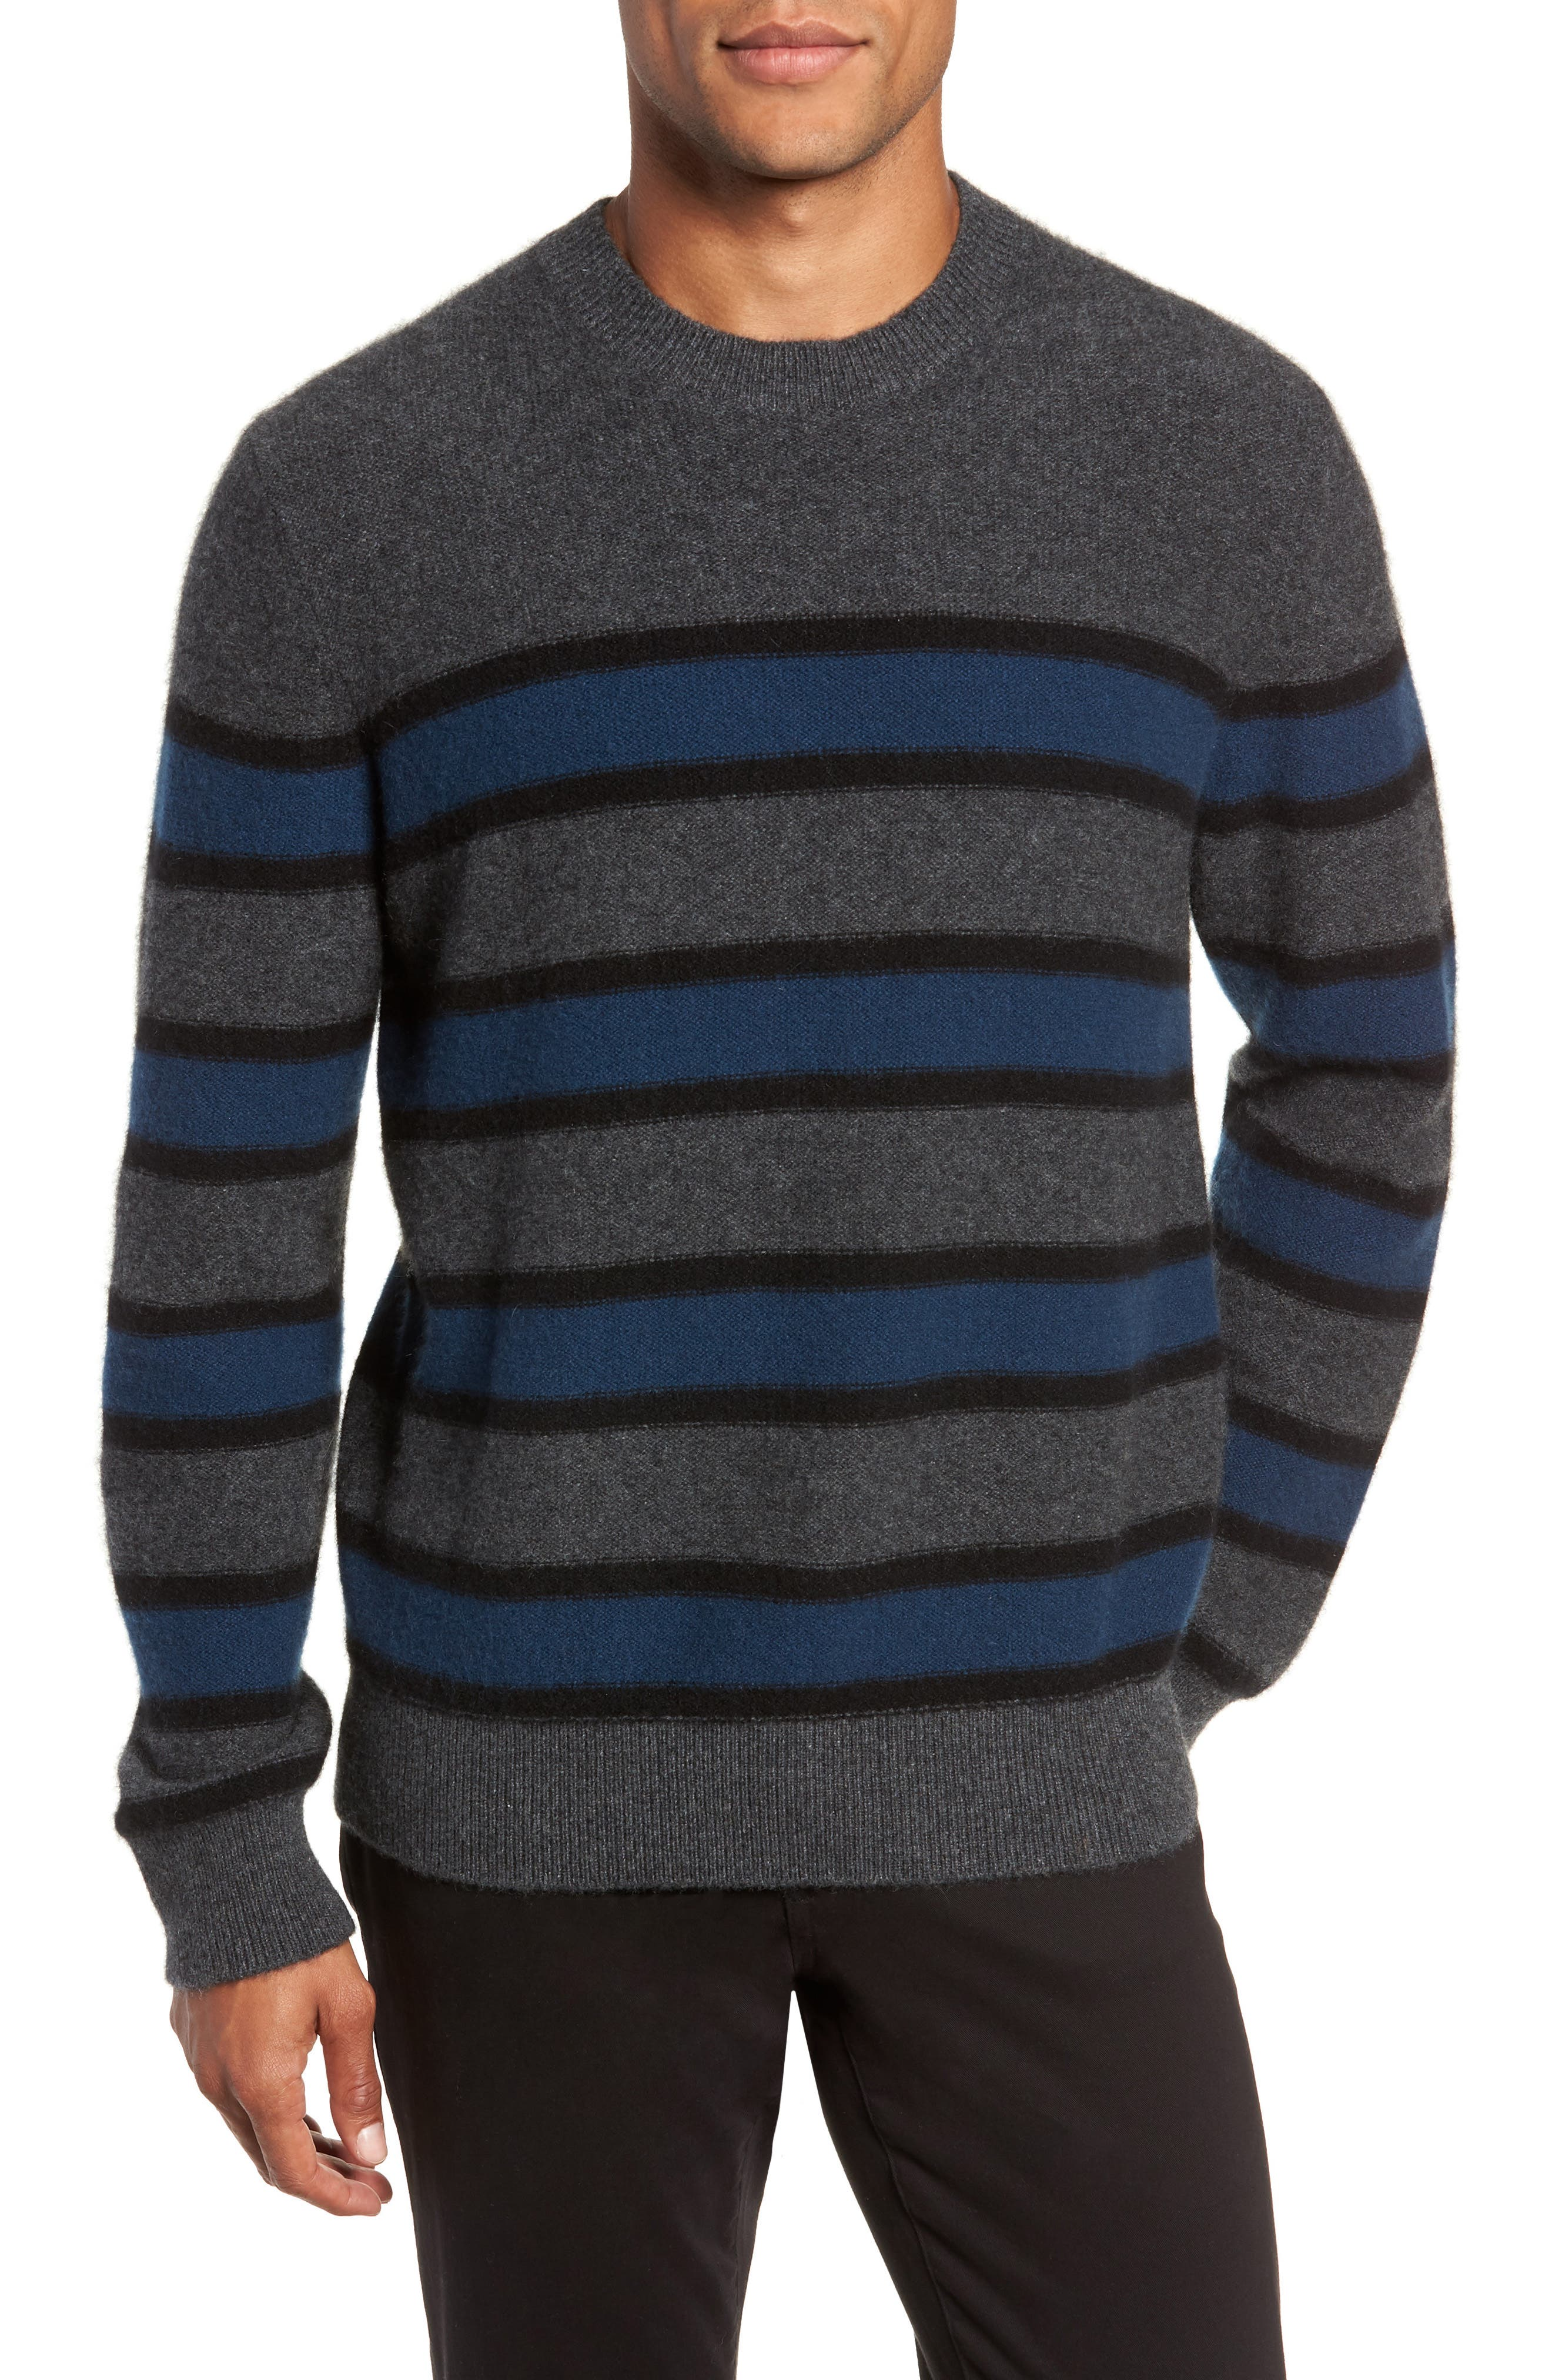 Regular Fit Stripe Cashmere Sweater,                             Main thumbnail 1, color,                             DARK HEATHER GREY/BLUE